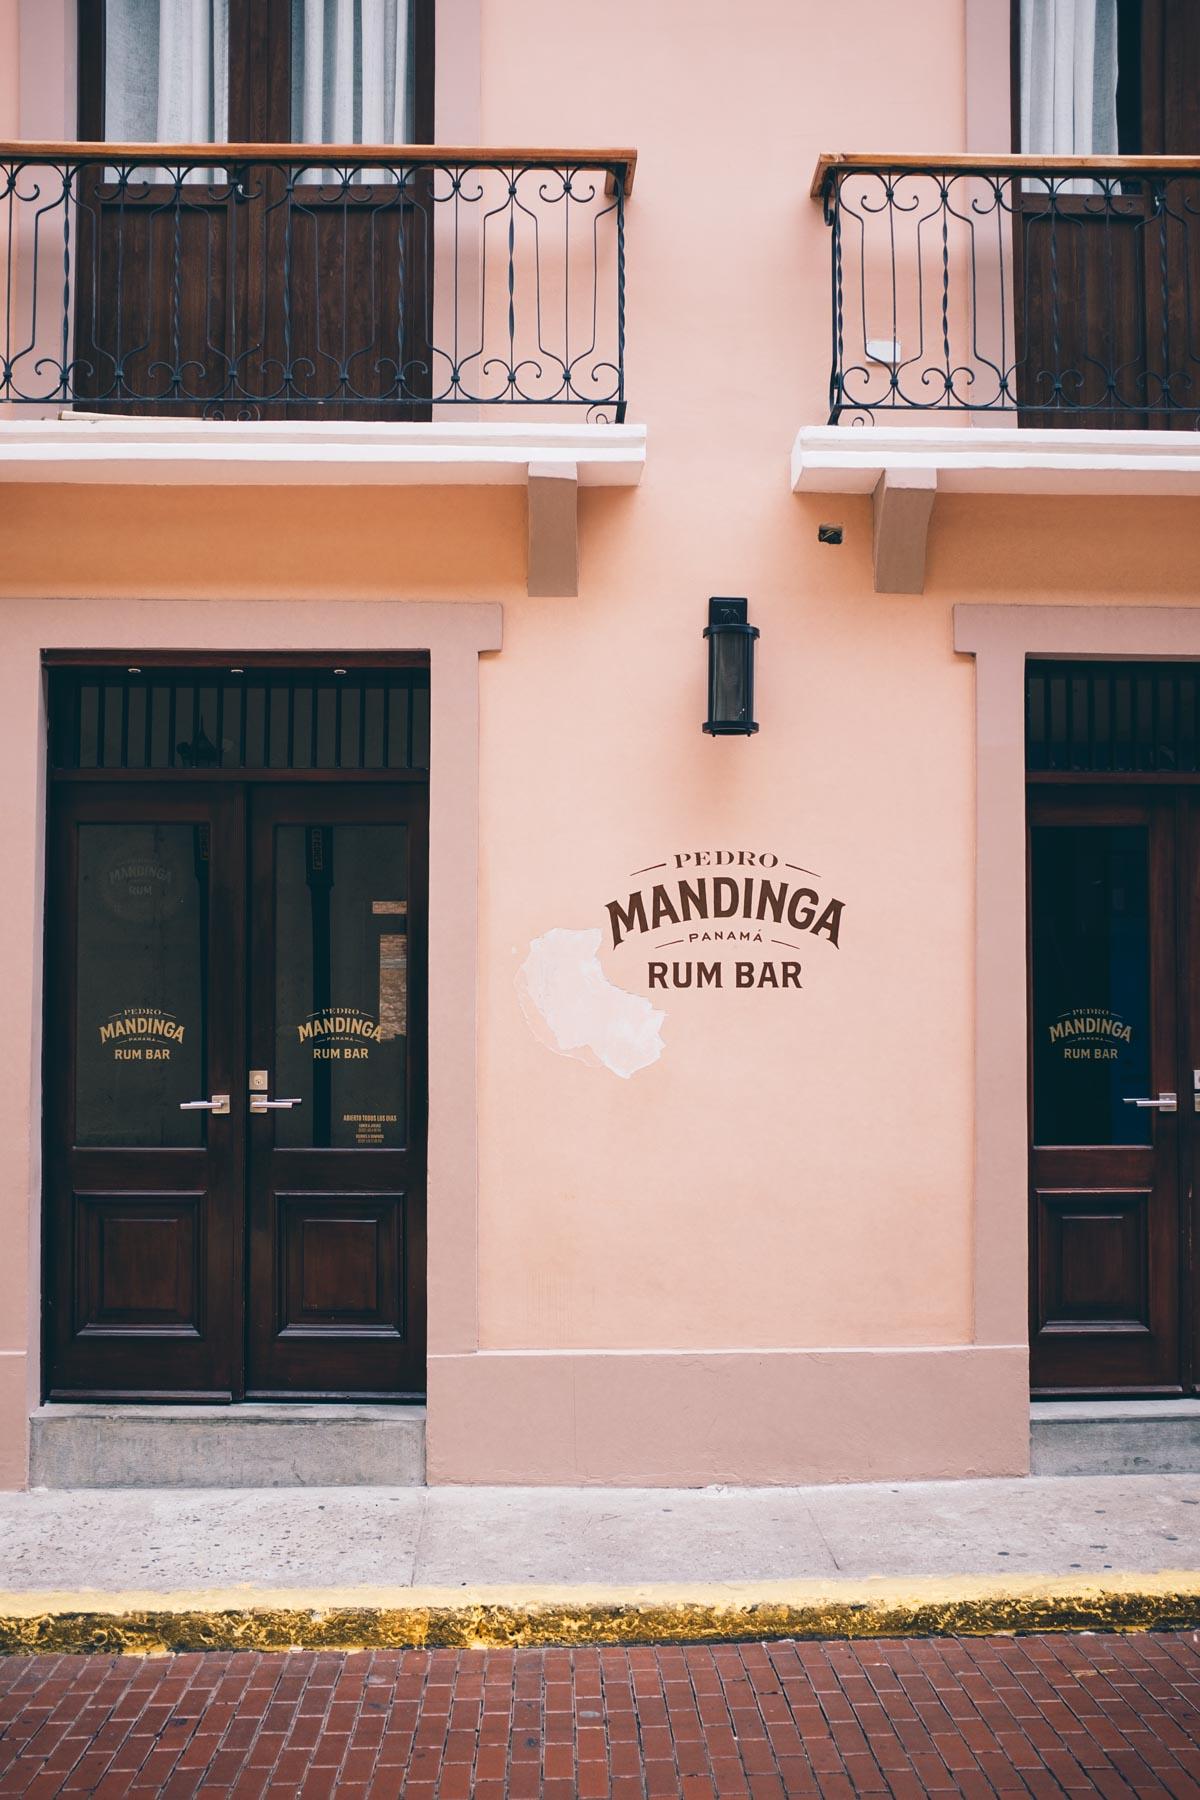 Mandiga Rum Bar in Casco Viejo, Panama City